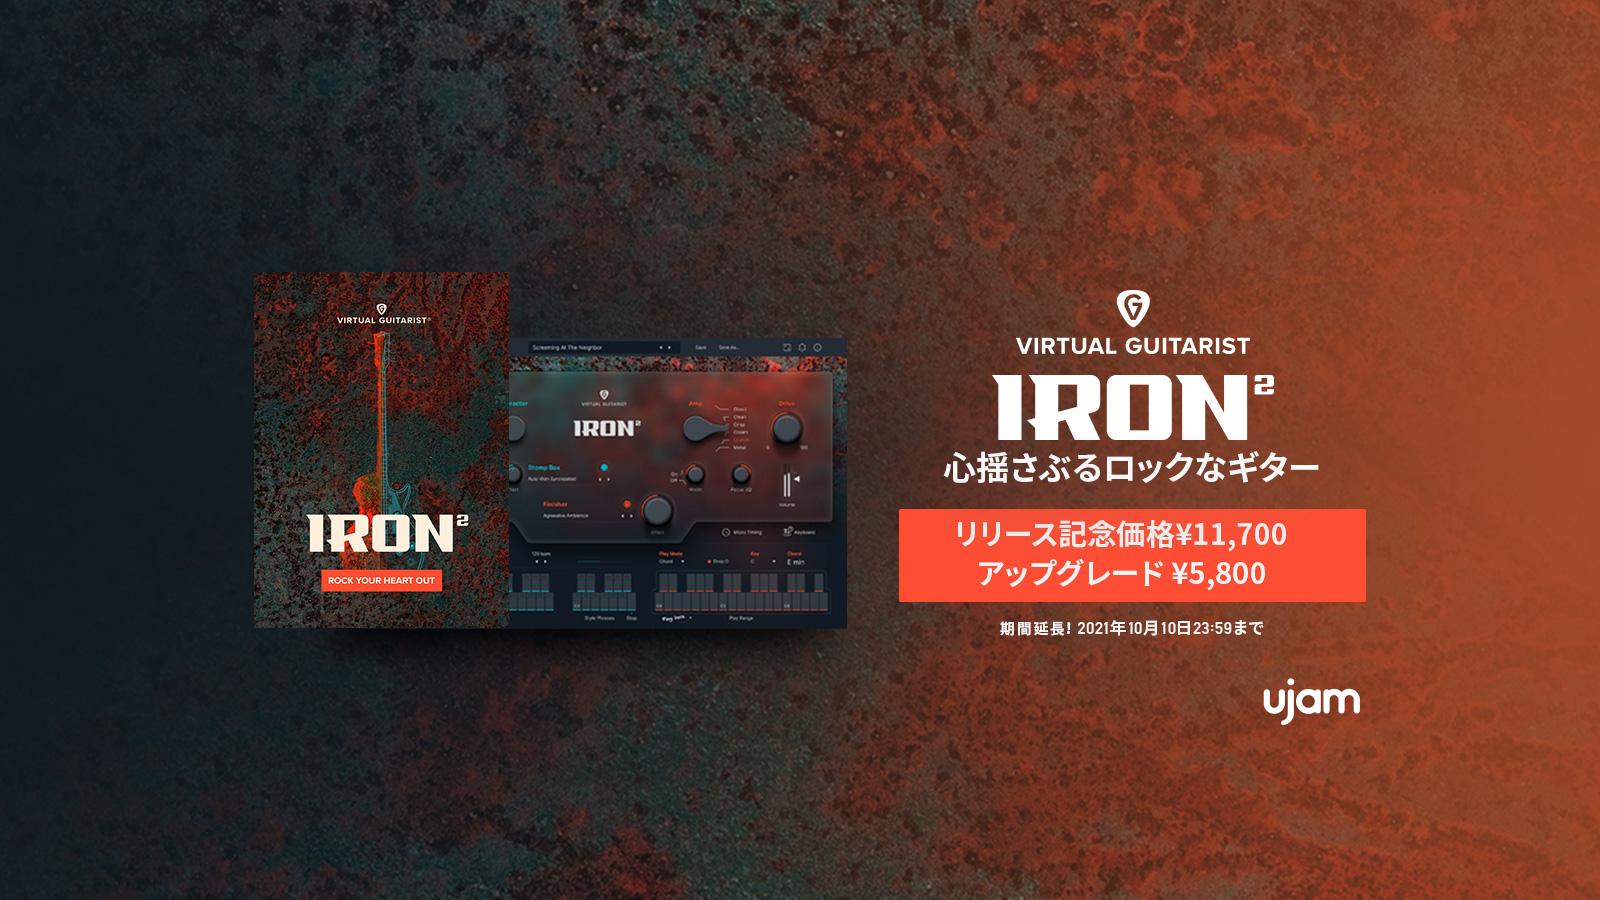 UJAM Virtual Guitarist IRON 2新登場!